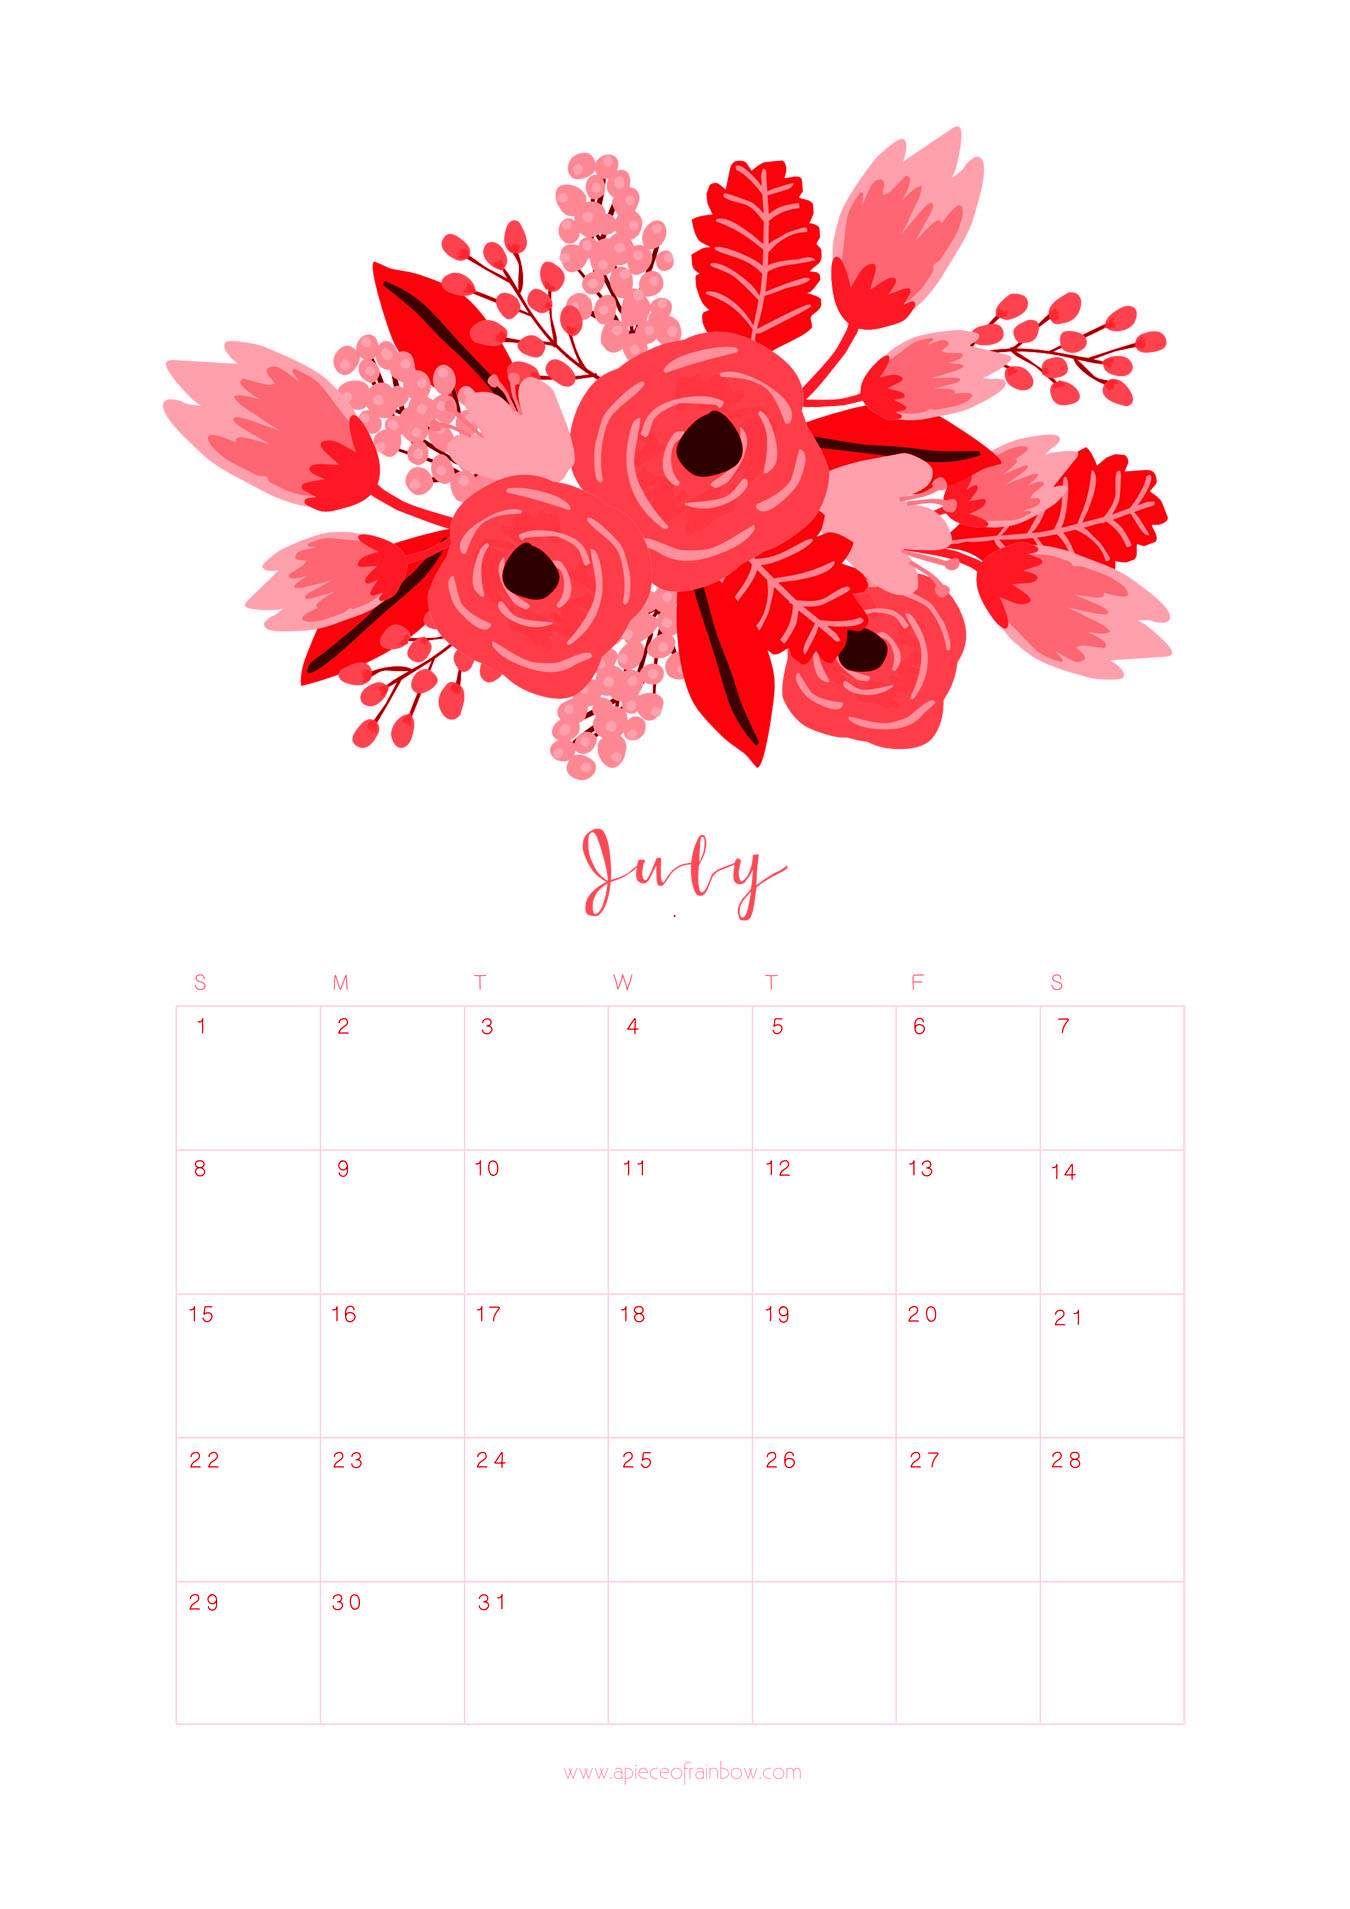 July 2018 Flower Calendar Printable 2018 Calendars